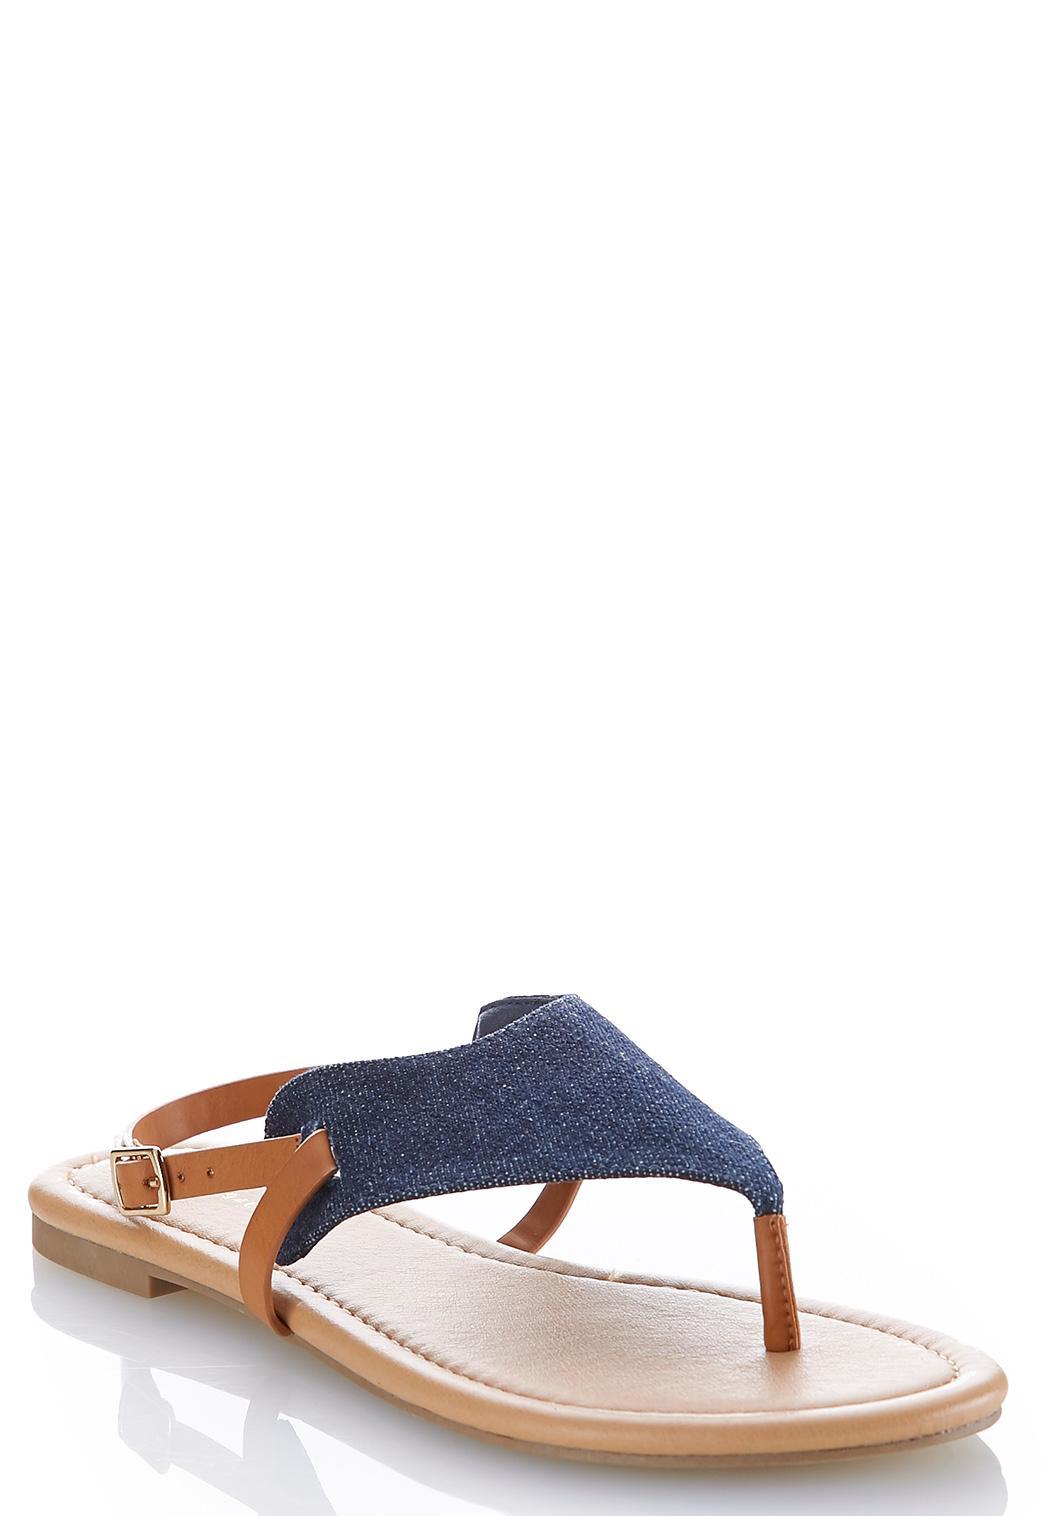 Denim Thong Sandals